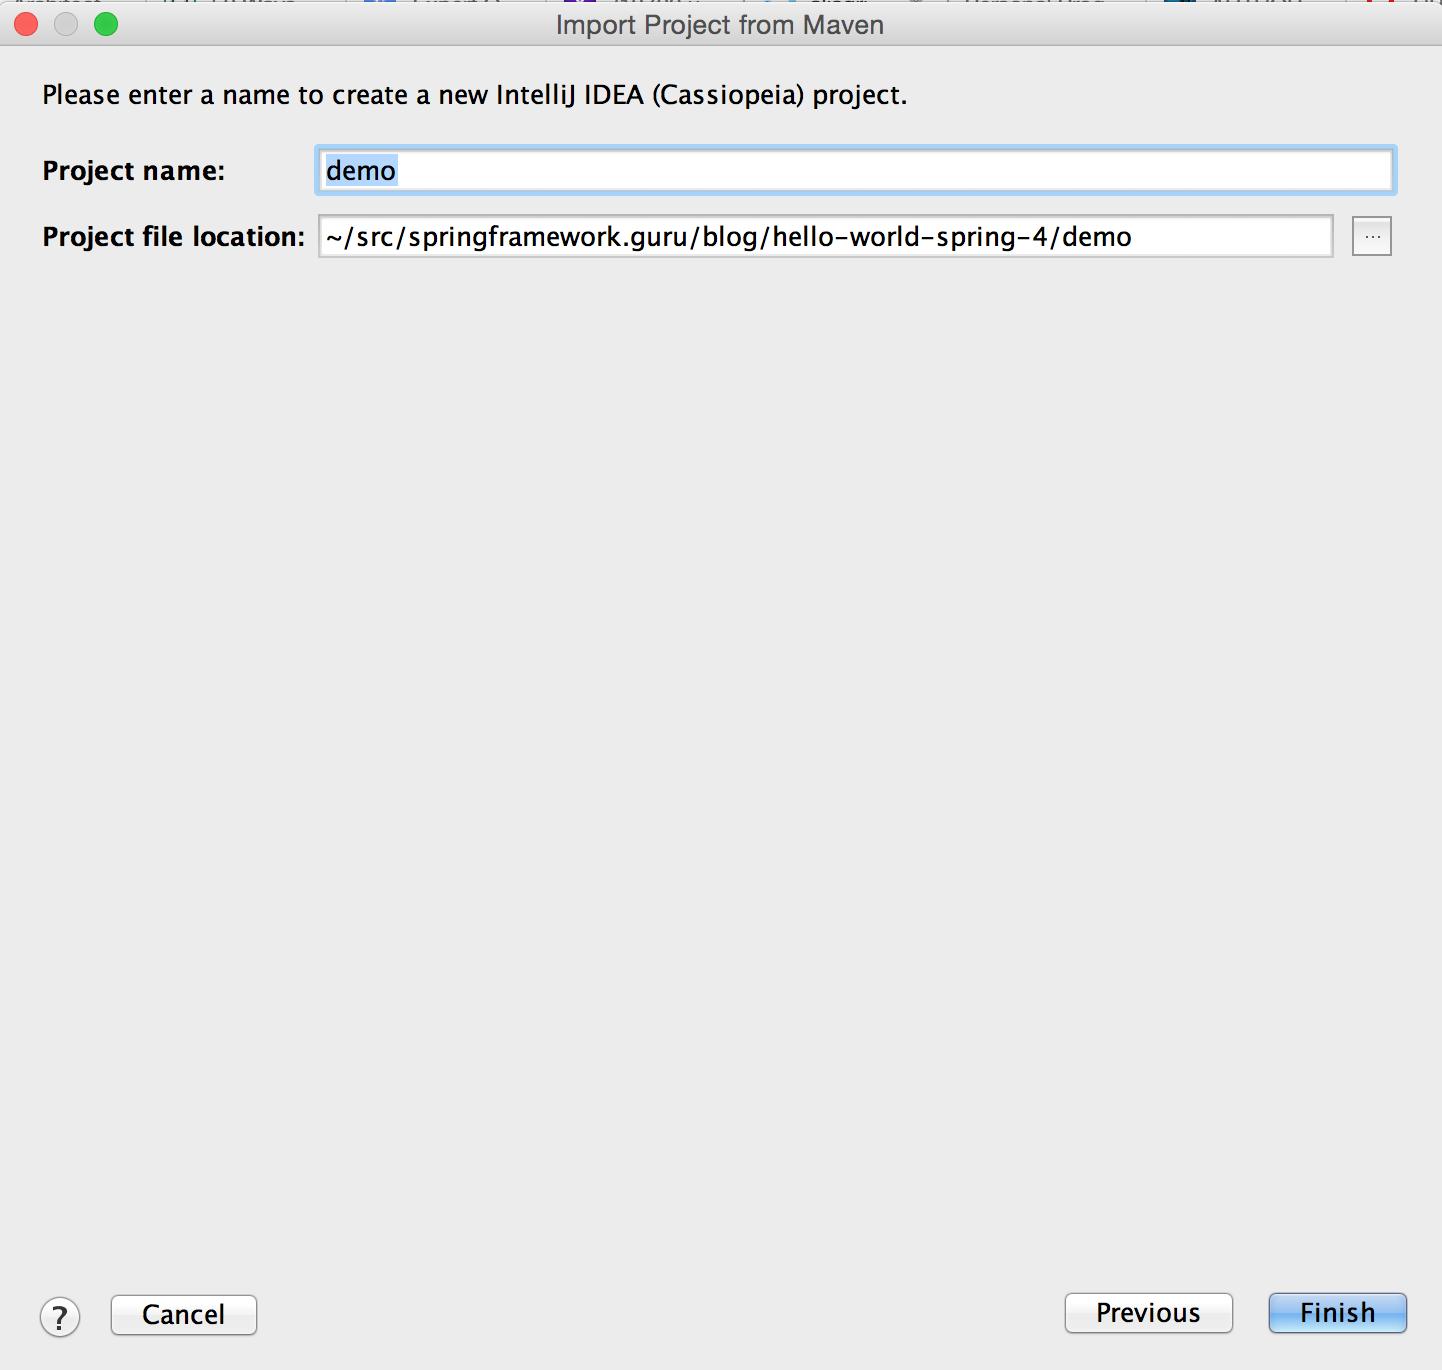 Hello World With Spring 4 - Spring Framework Guru